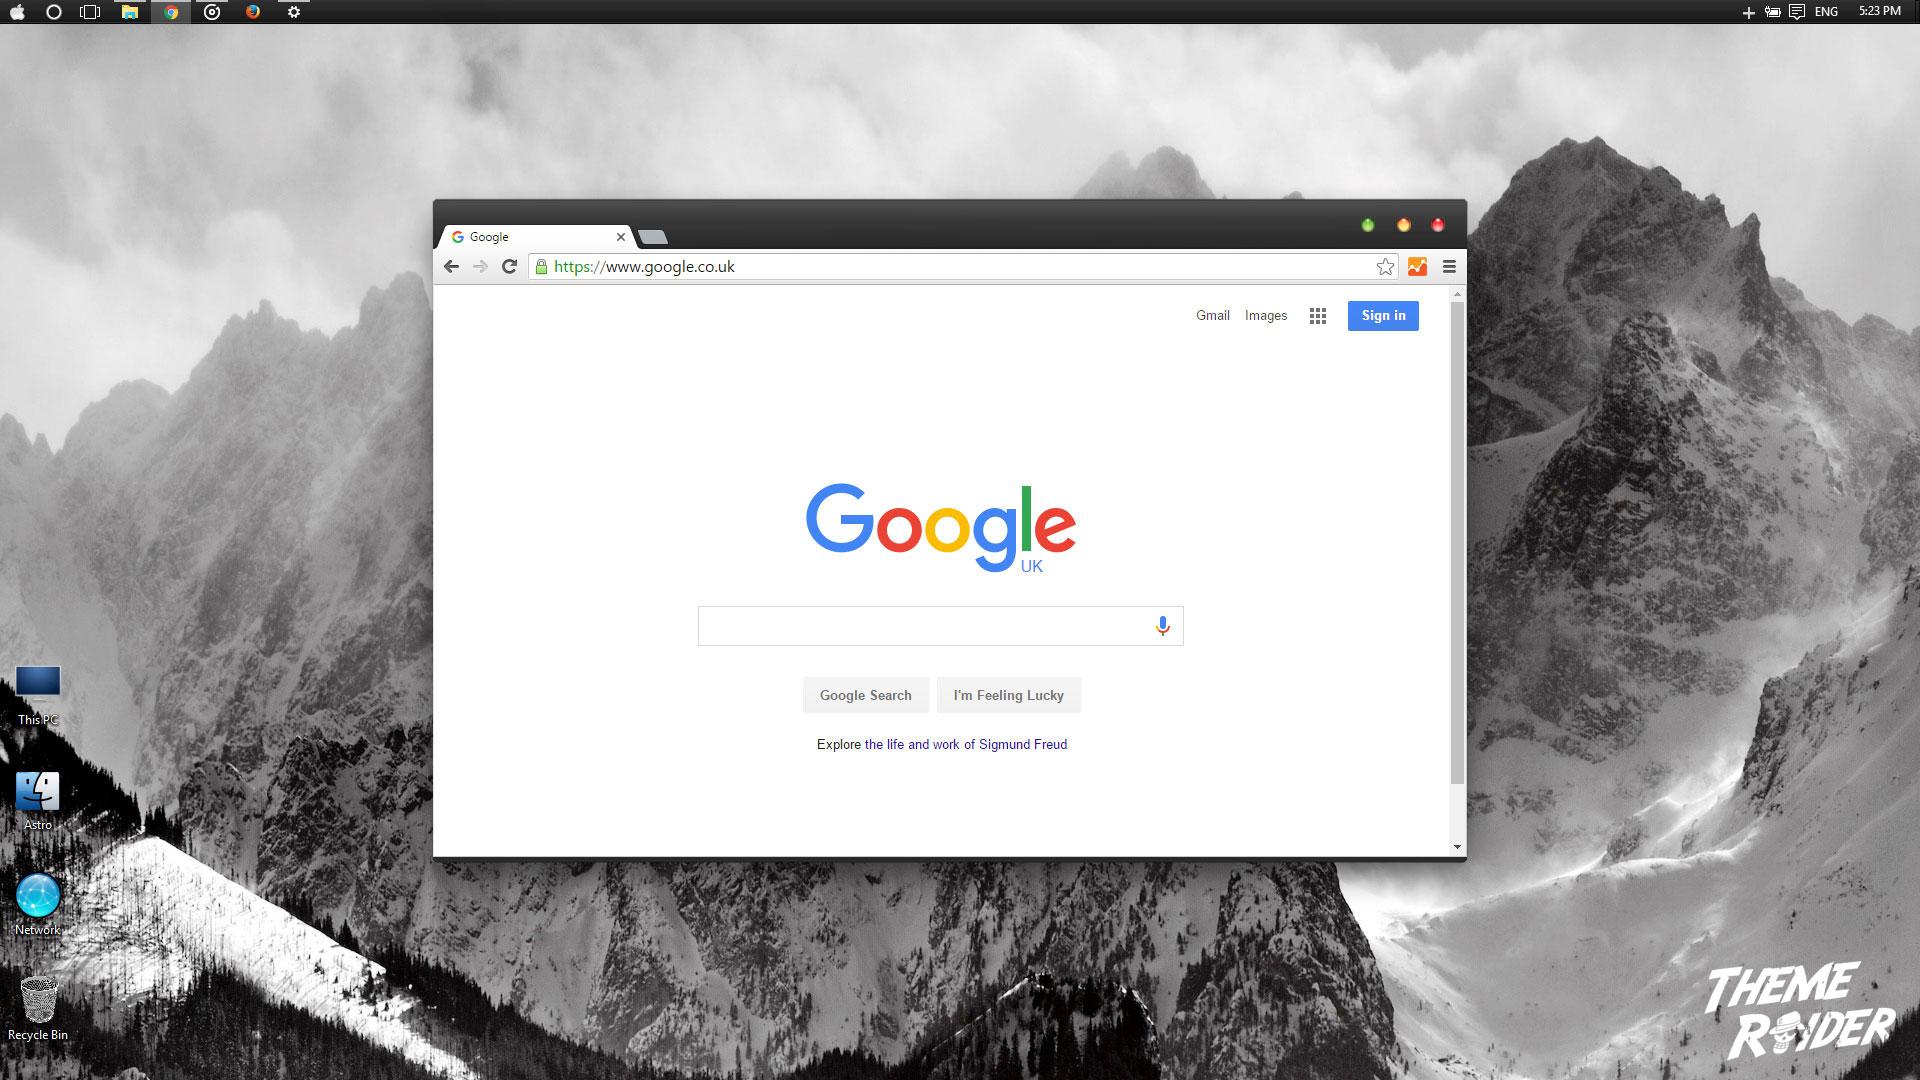 Google themes leopard - Apple S